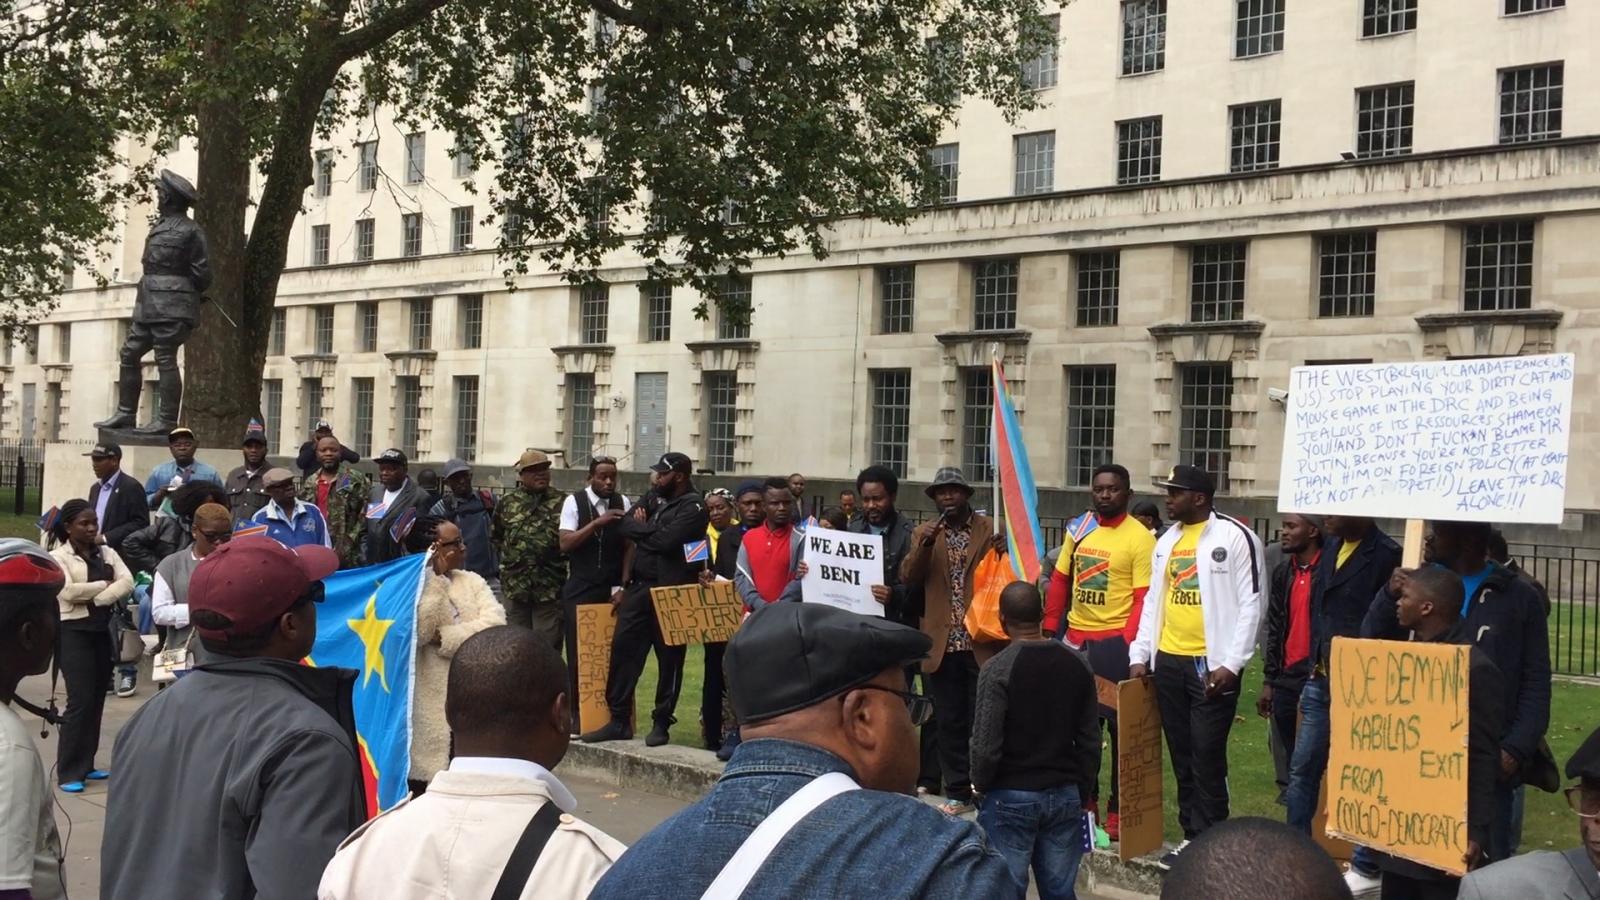 Dozens gather outside Downing Street to call on DRC President Joseph Kabila to step down